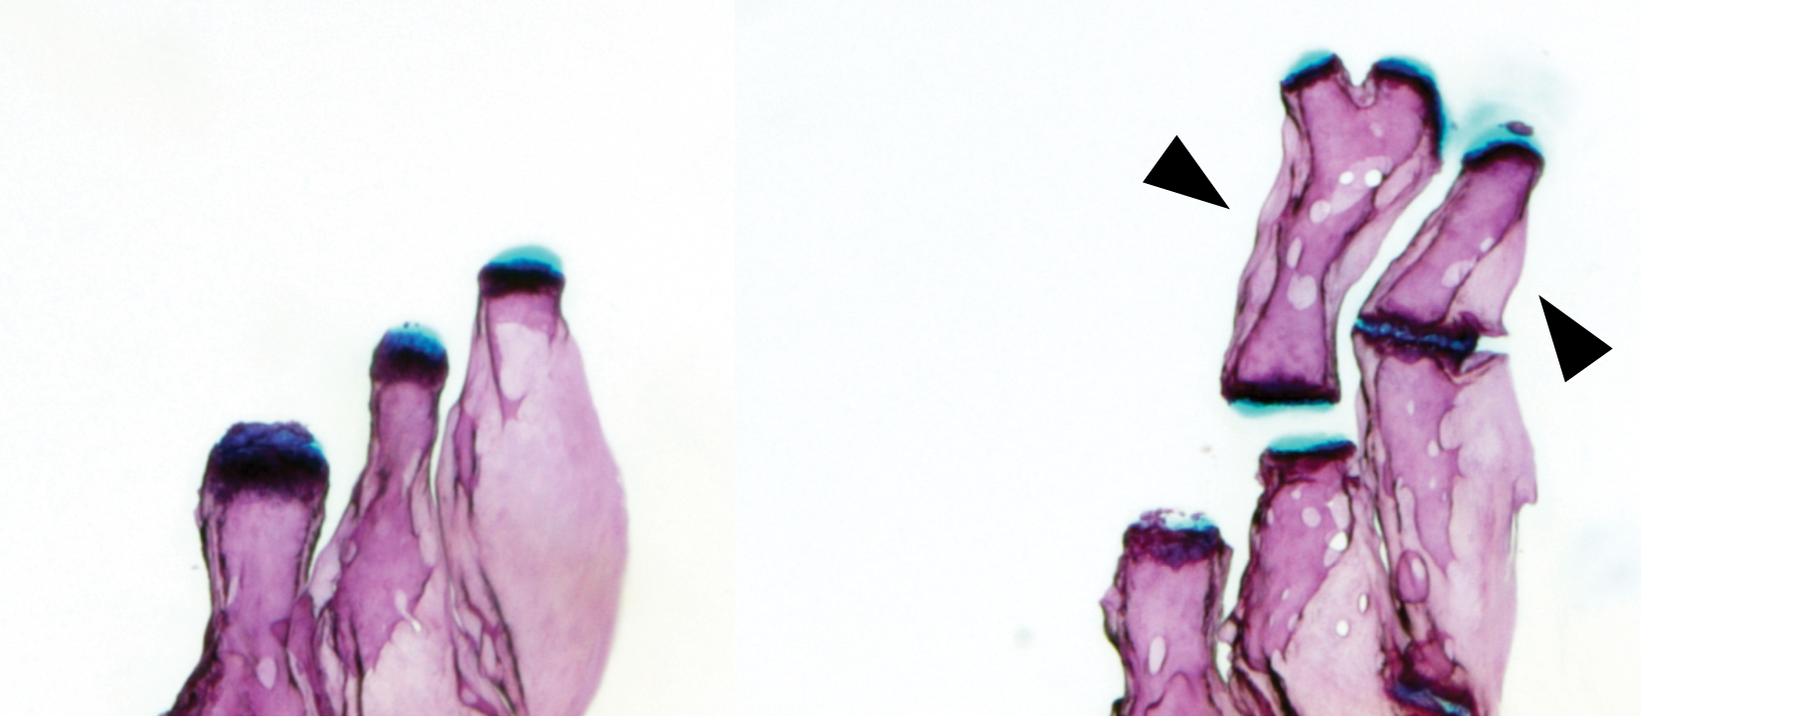 A Simple Genetic Change Adds Limb-Like Bones to Zebrafish Fins